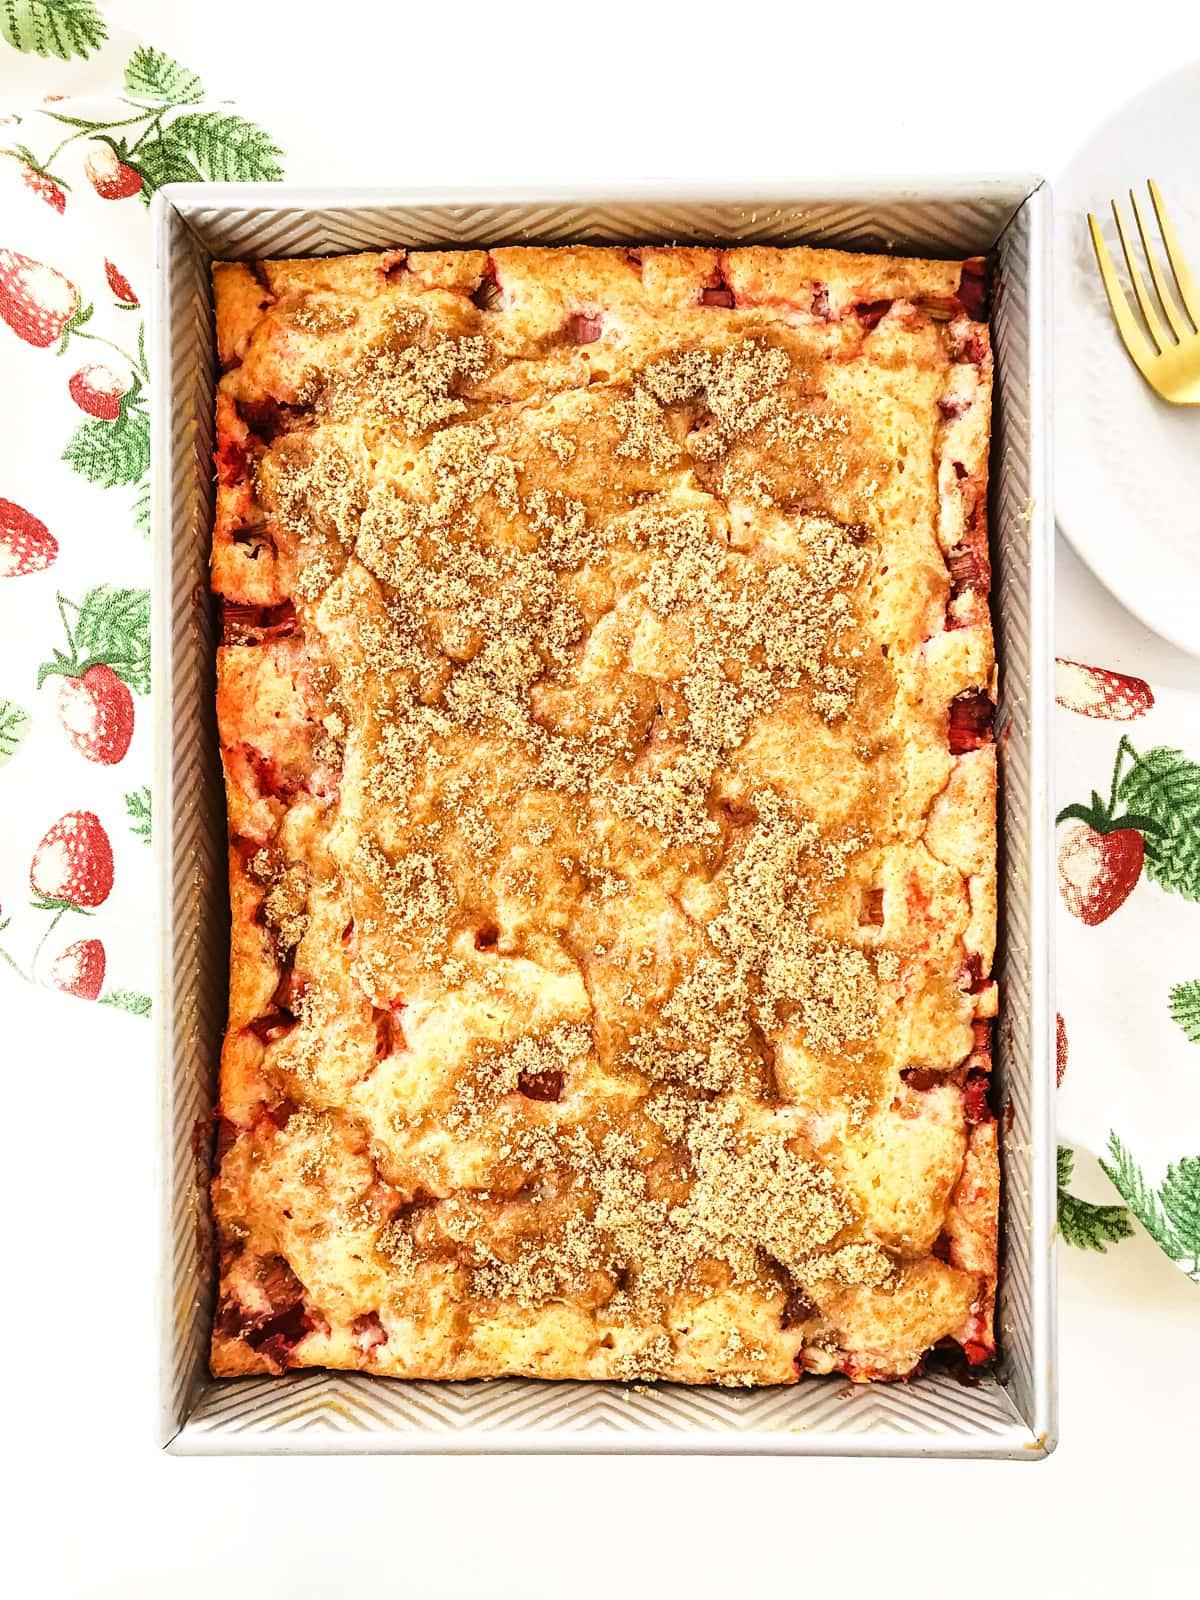 Easy Strawberry Rhubarb Cake (with Strawberry Jello)